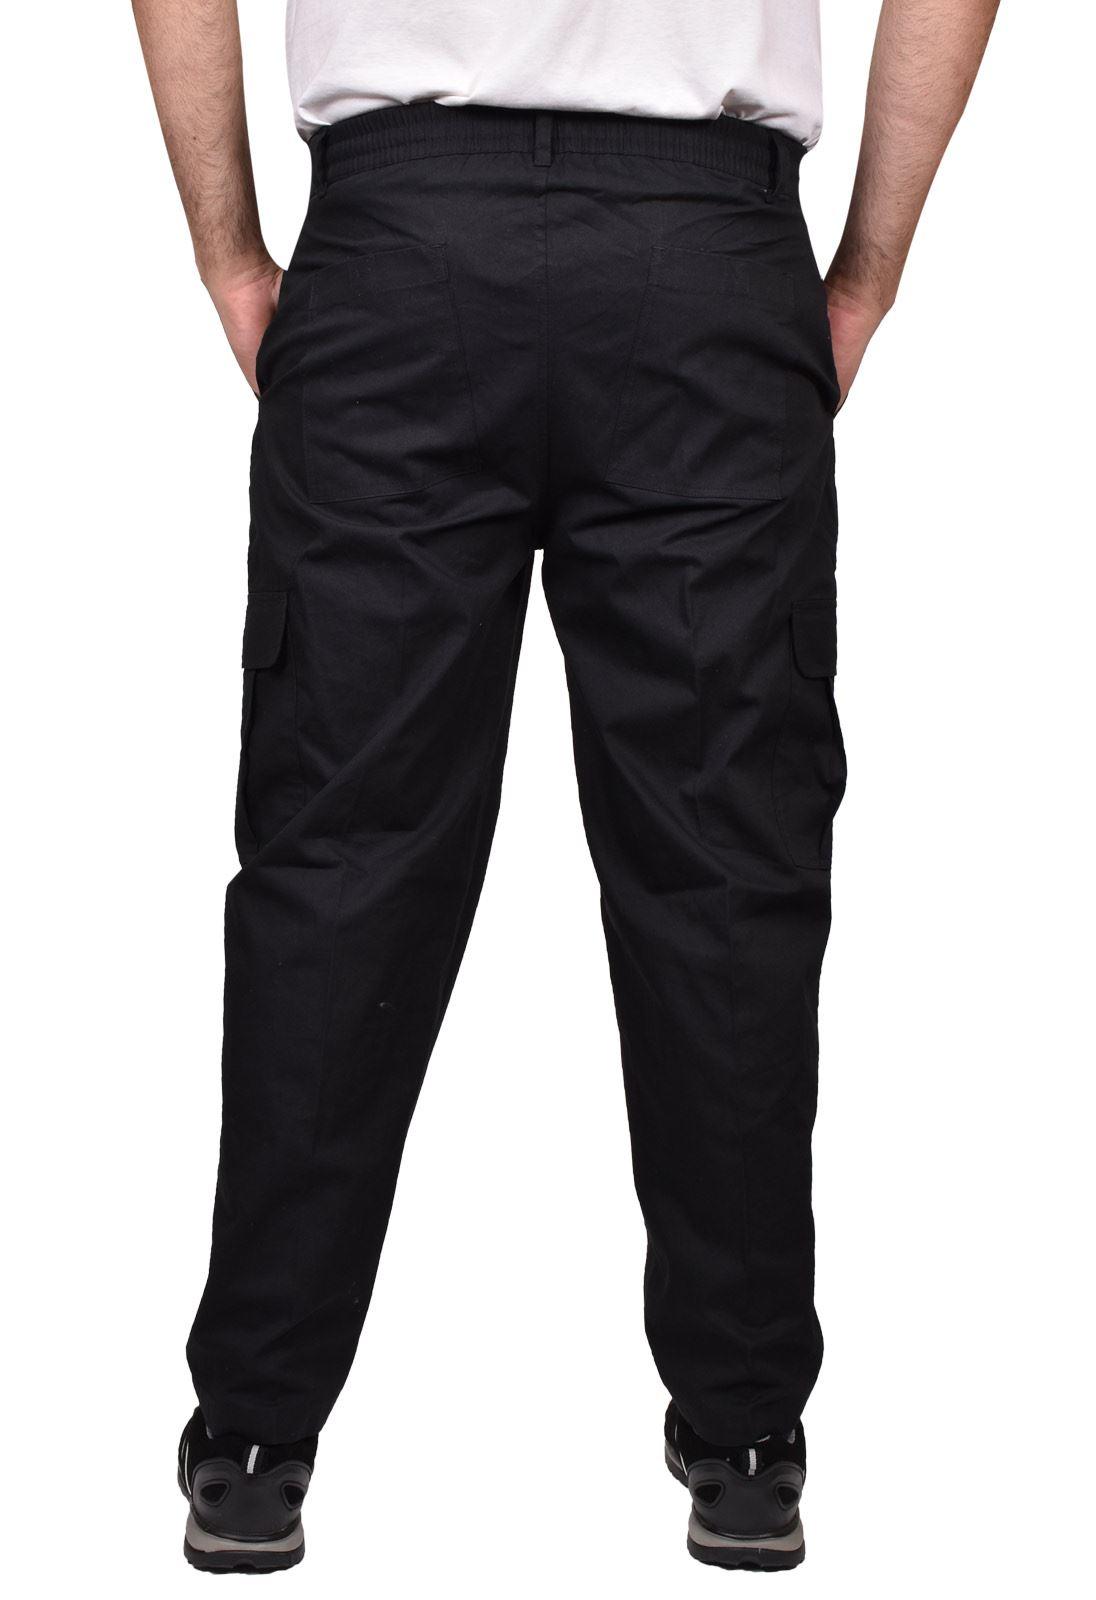 Para-Hombre-De-Carga-Combate-Pantalones-De-Trabajo-Bolsillos-Patrulla-Tactico-Pro-Algodon-Pantalones miniatura 4